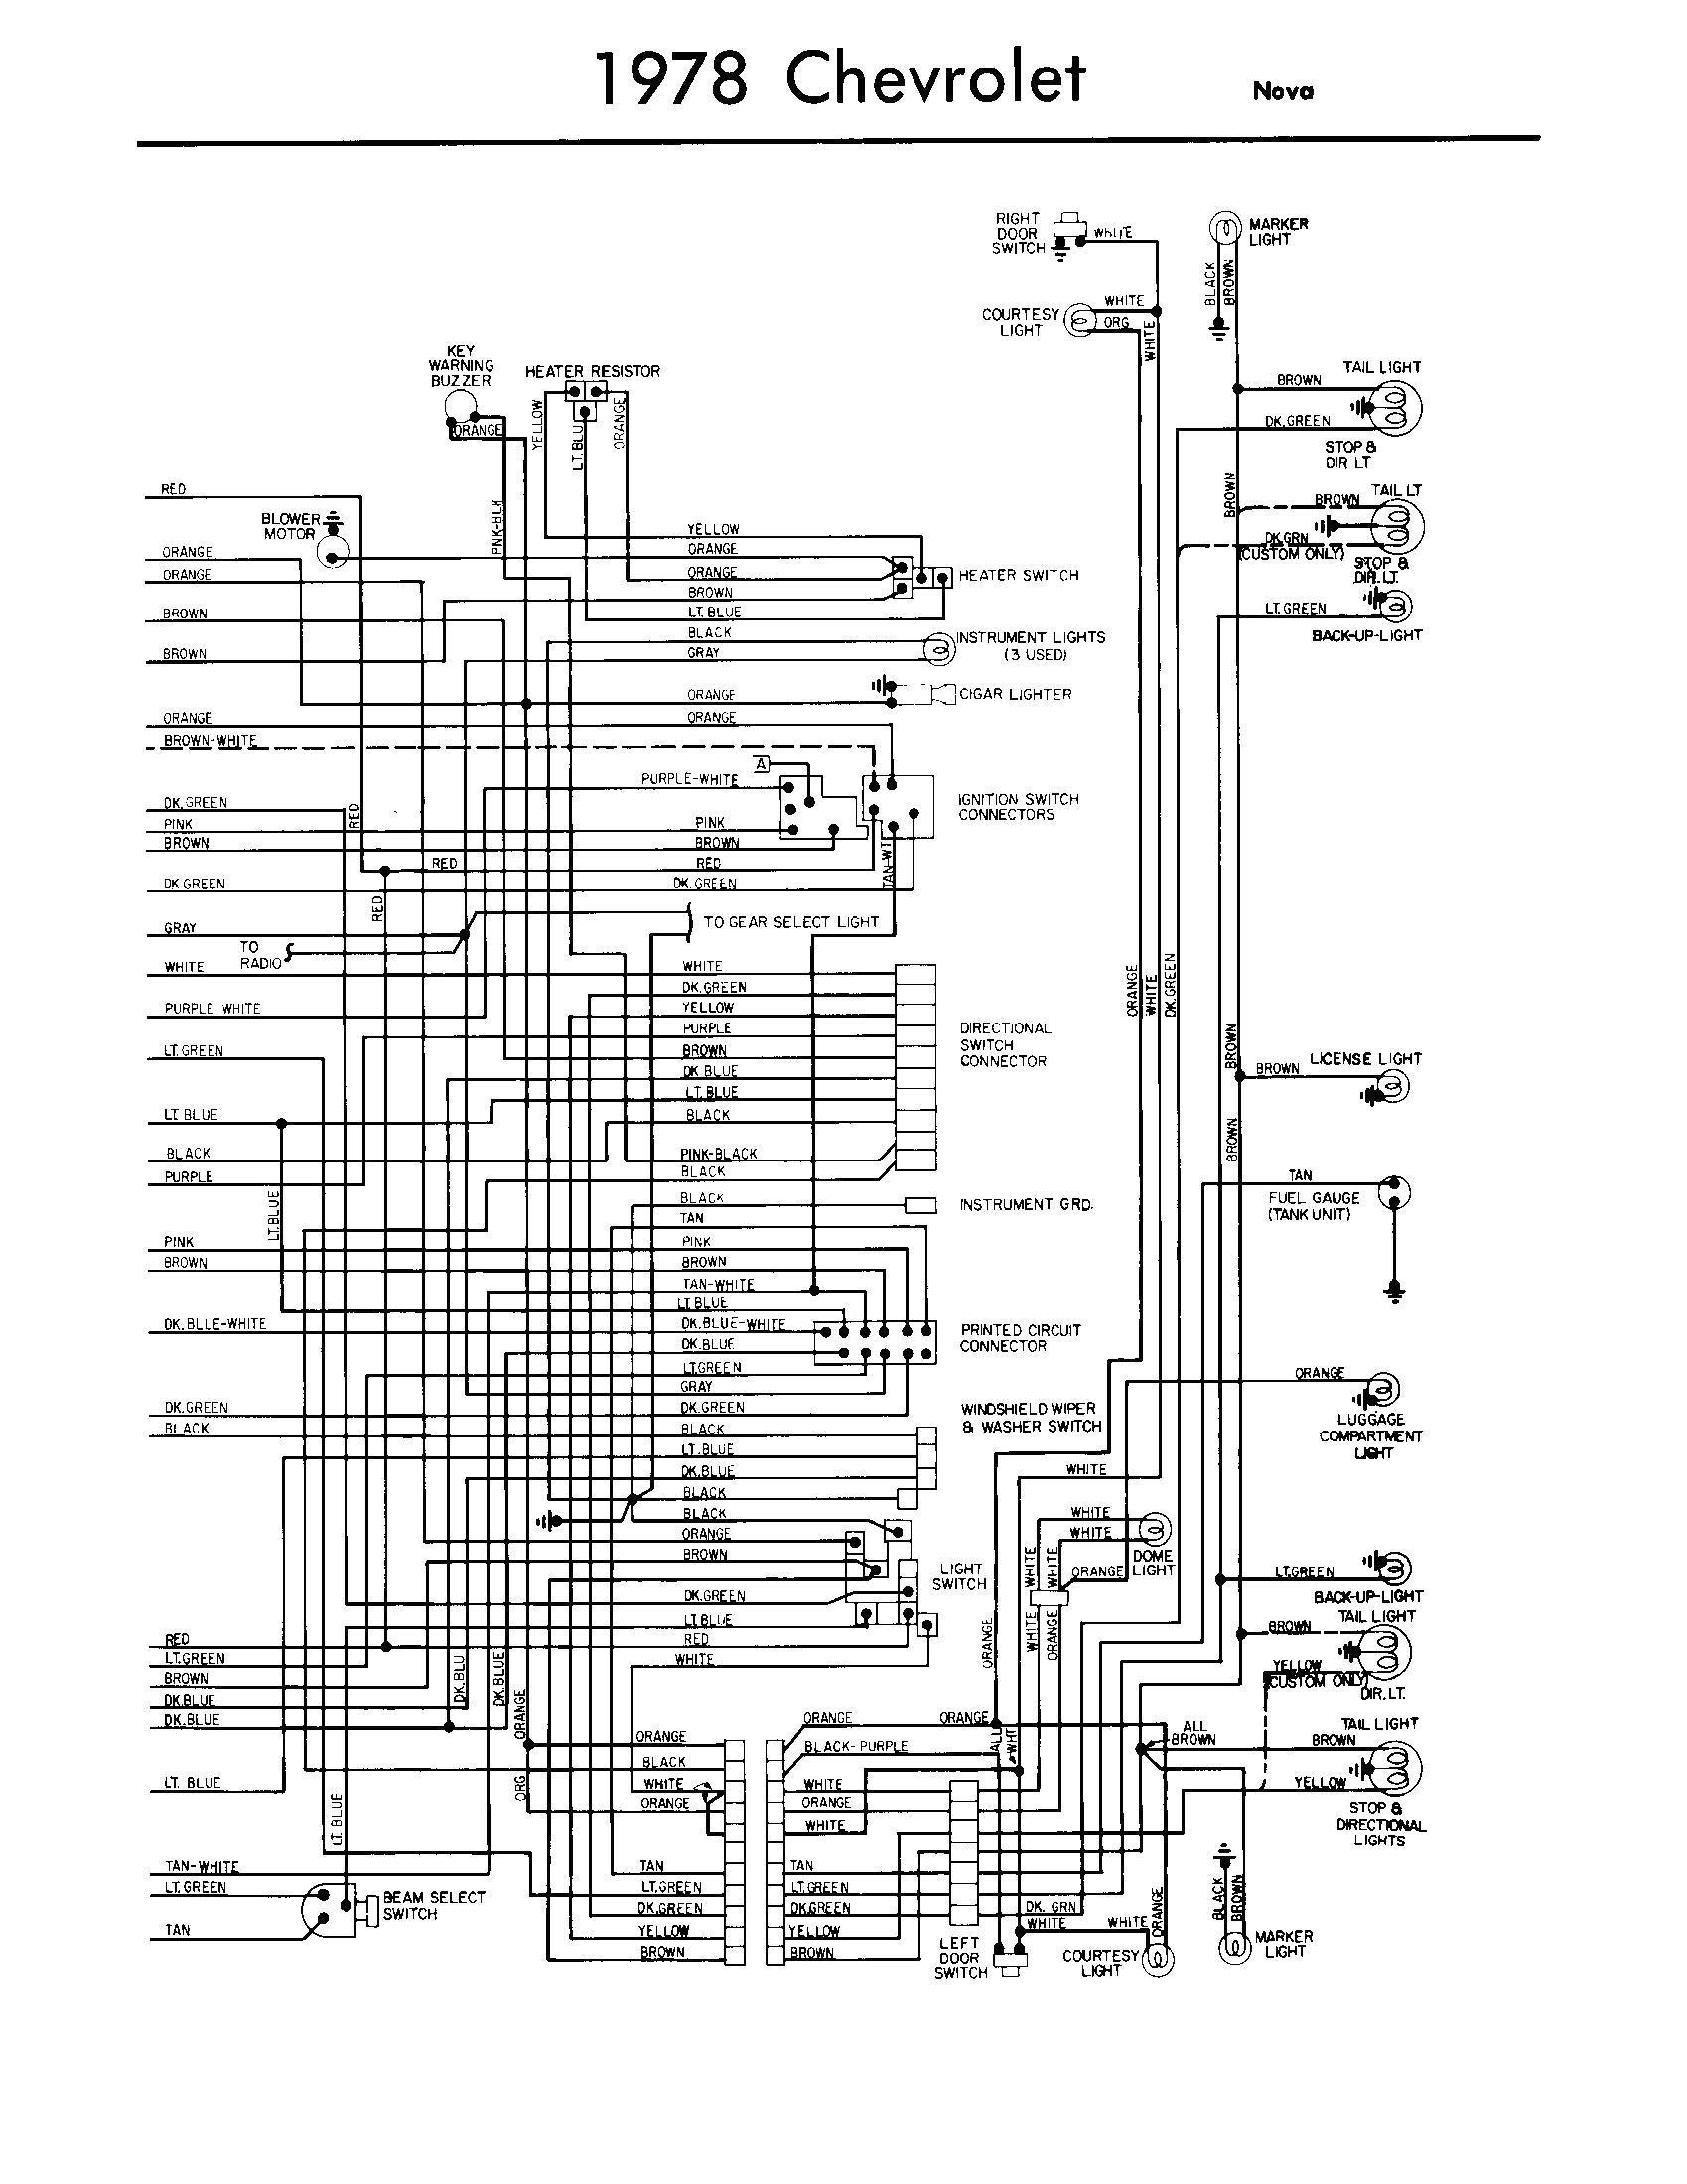 1977 corvette dash wiring diagram rate 1977 chevrolet wiring diagram download wiring diagrams e280a2 of 1977 corvette dash wiring diagram jpg